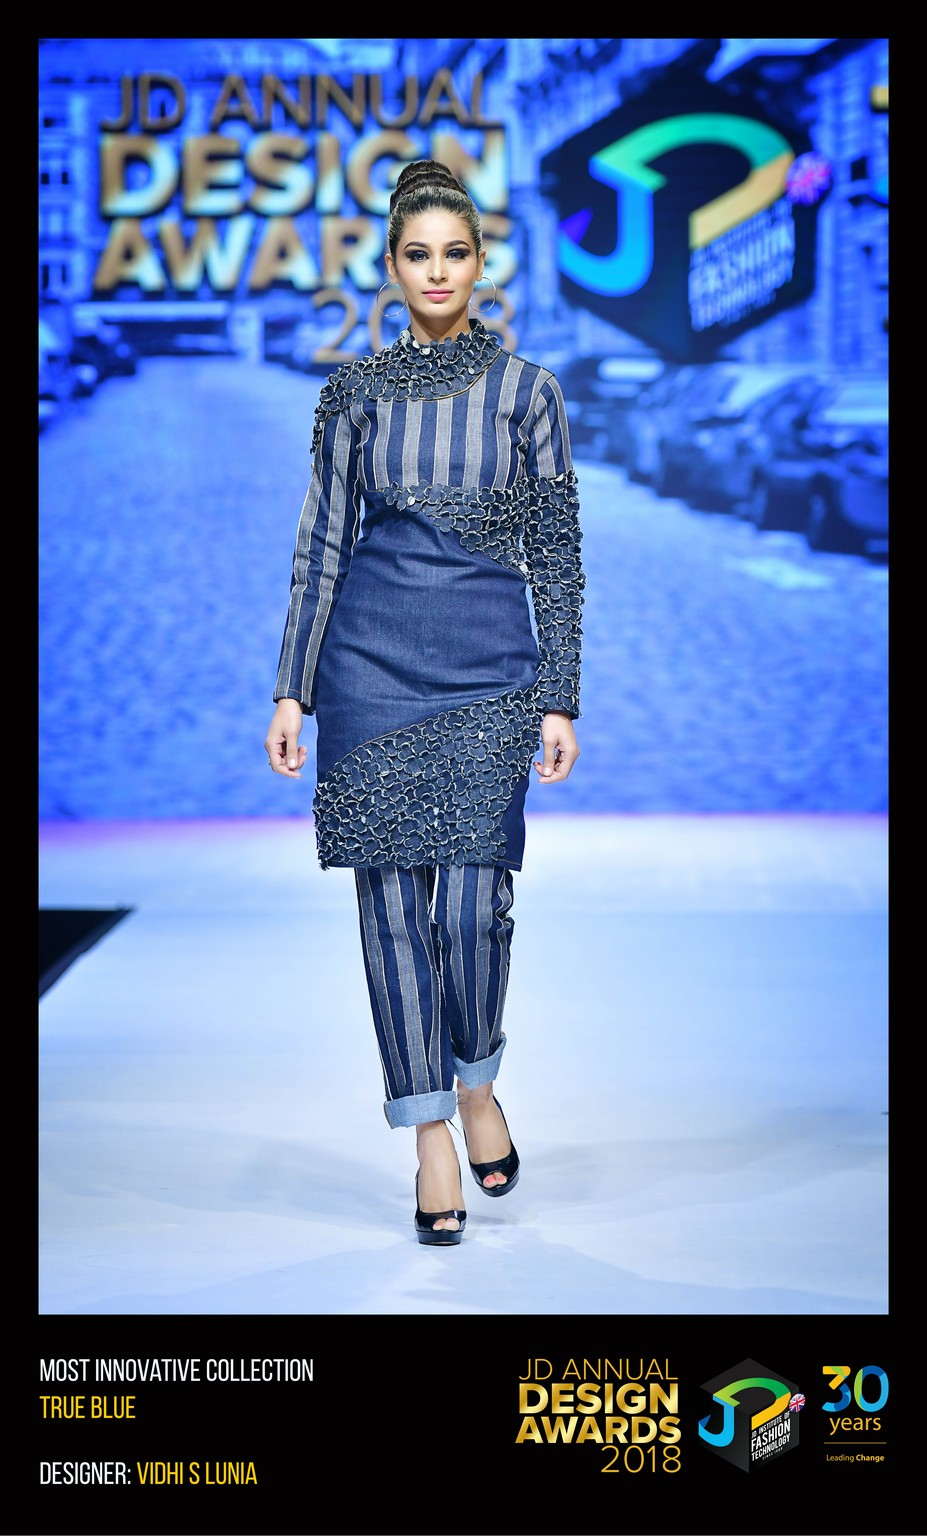 True Blue – Change – JD Annual Design Awards 2018 | Designer: Vidhi Lunia (ADFD 2015) | Photography : Jerin Nath (@jerin_nath) true blue - True Blue Photos JDW FB10 - True Blue – Change – JD Annual Design Awards 2018